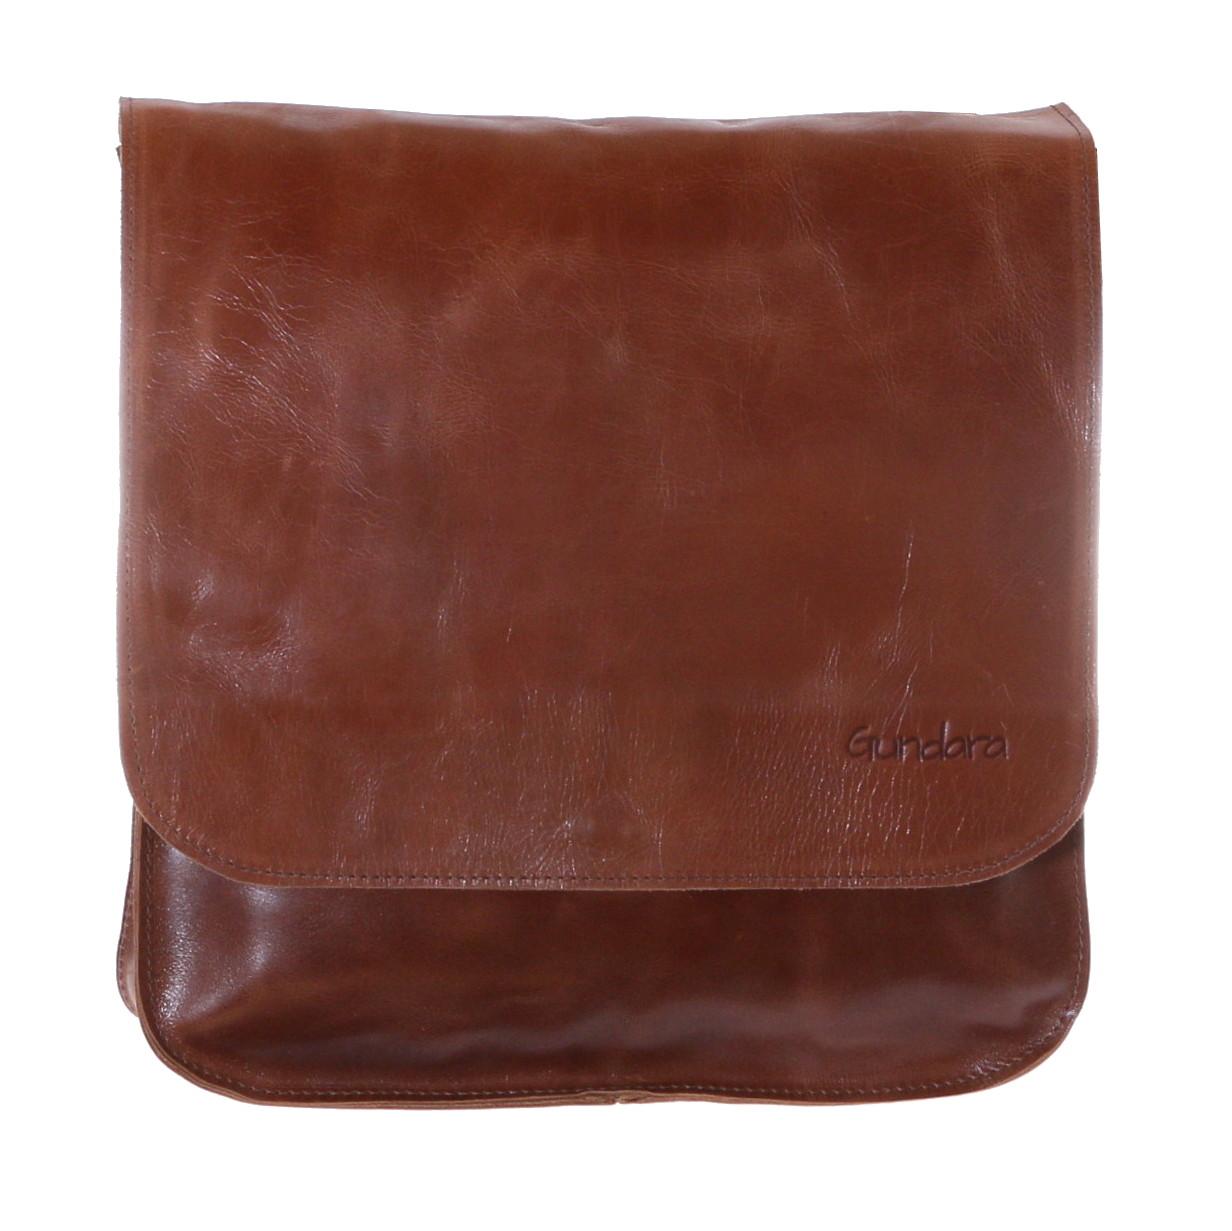 Gundara - fairtrade leather bag or backpack - genuine leather - handmade